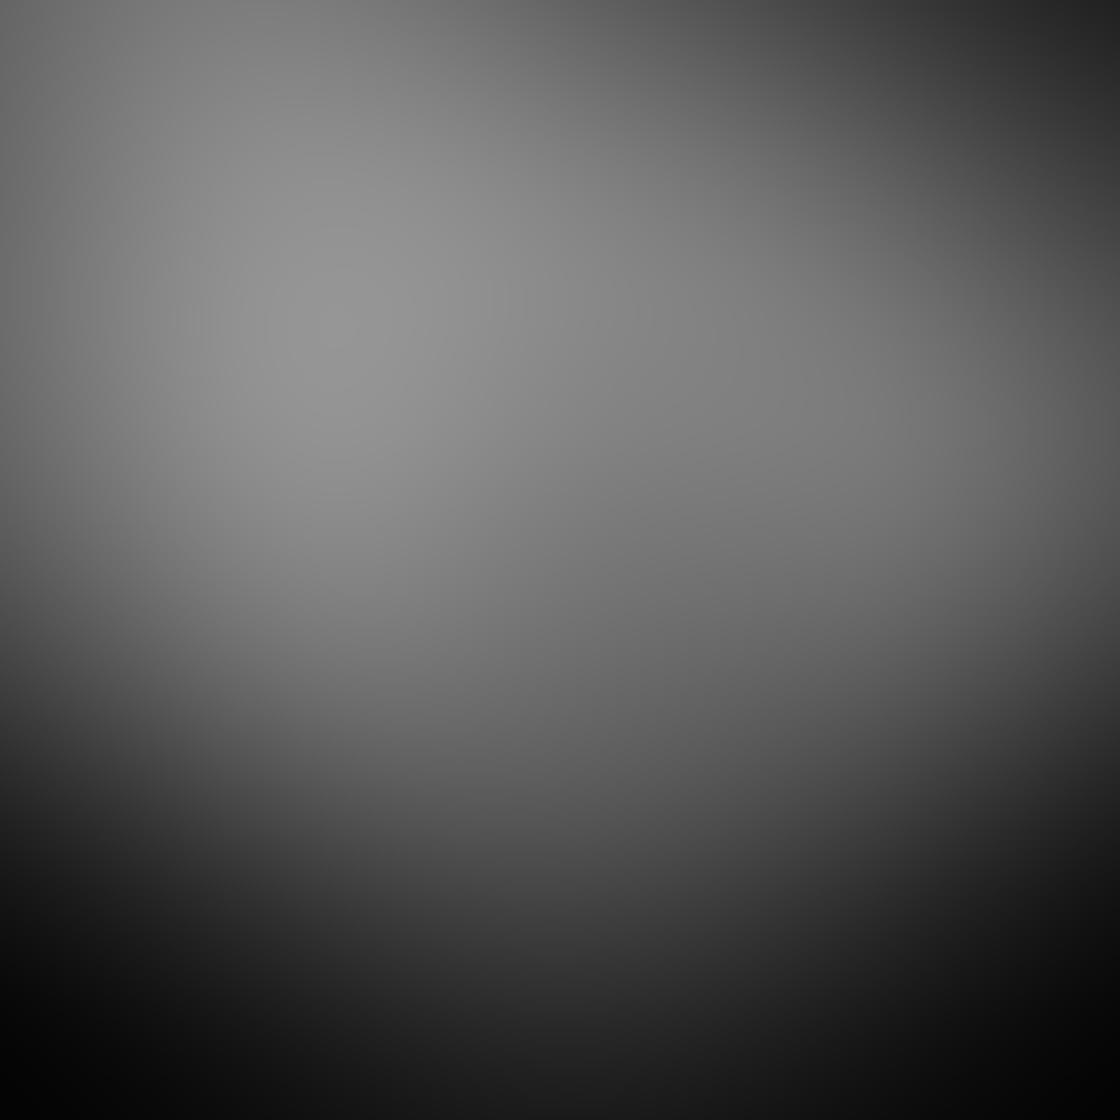 iPhone Photo Vignette 19